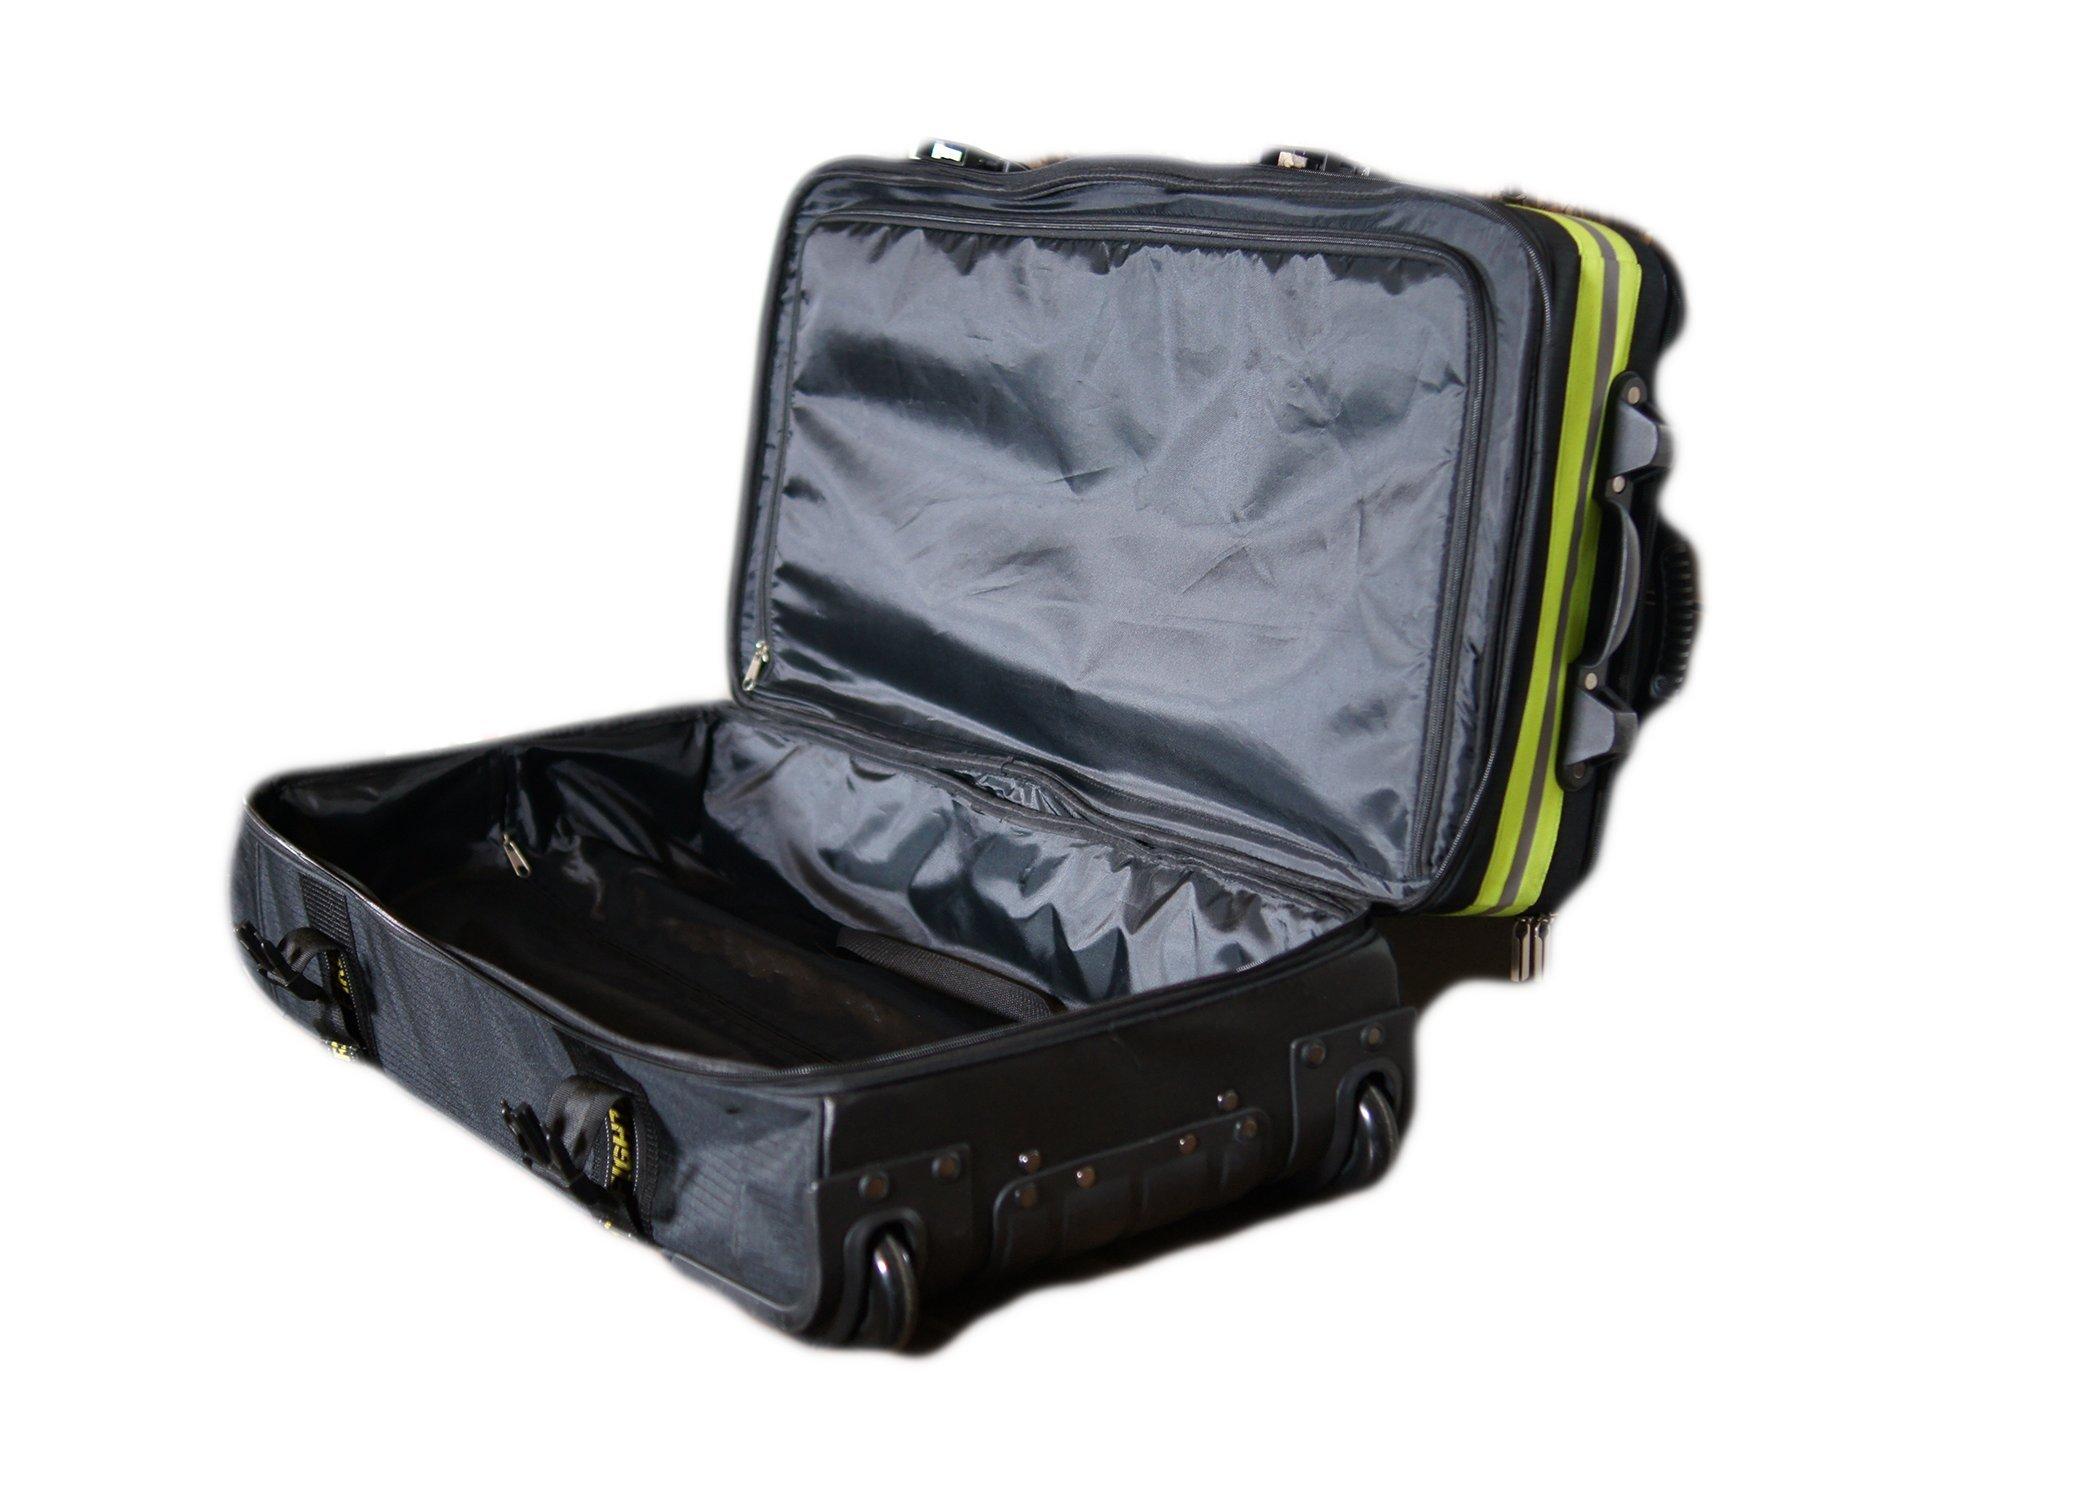 Fireflex Firefighter Rolling Travel Bag (Black) by Firefighters Merchandise (Image #4)